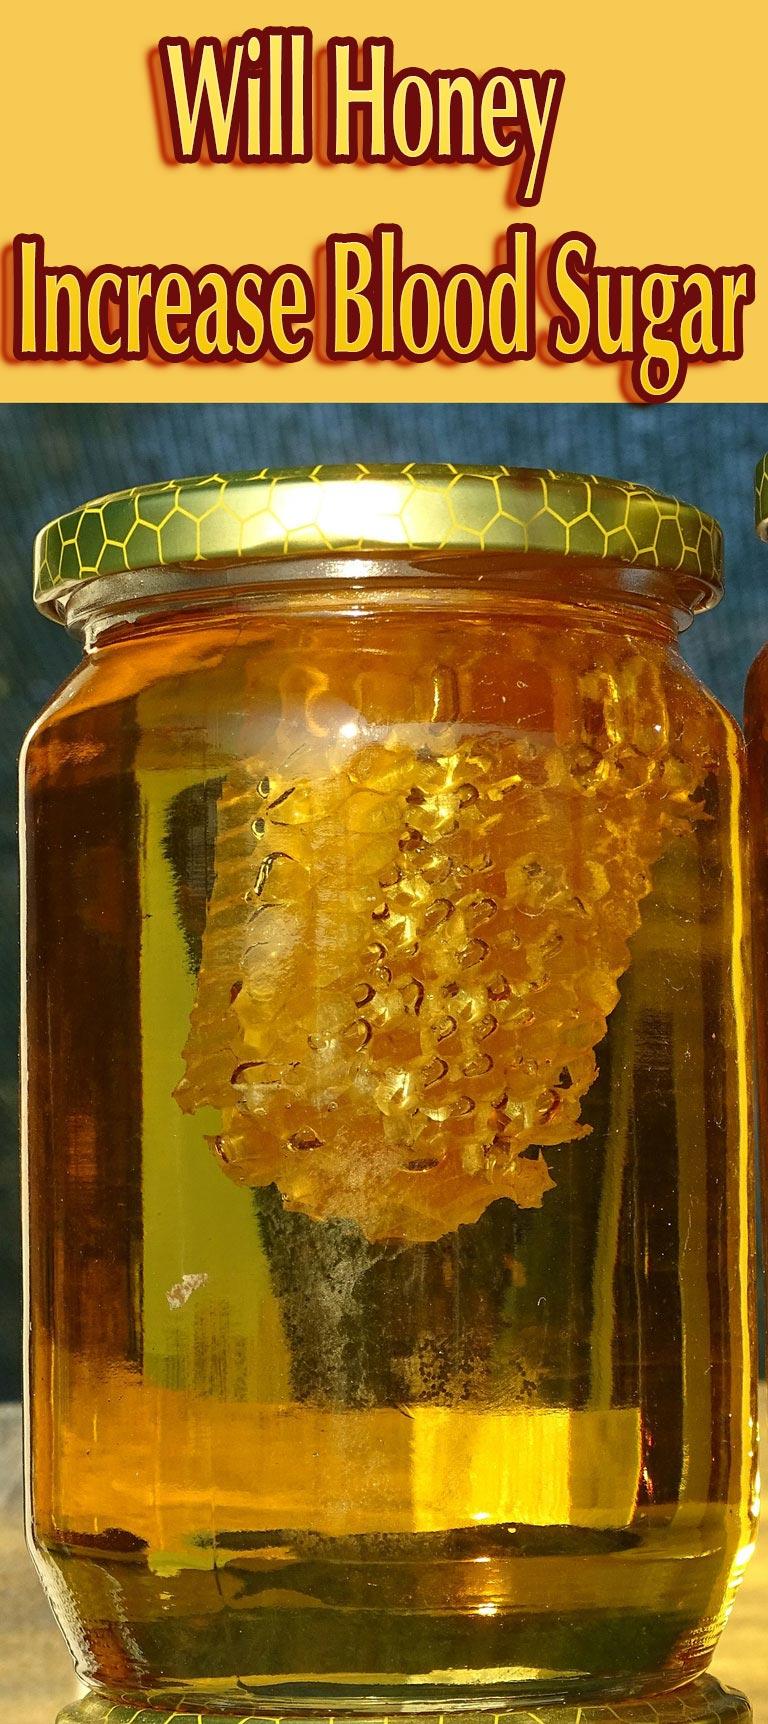 Will Honey Increase Blood Sugar?